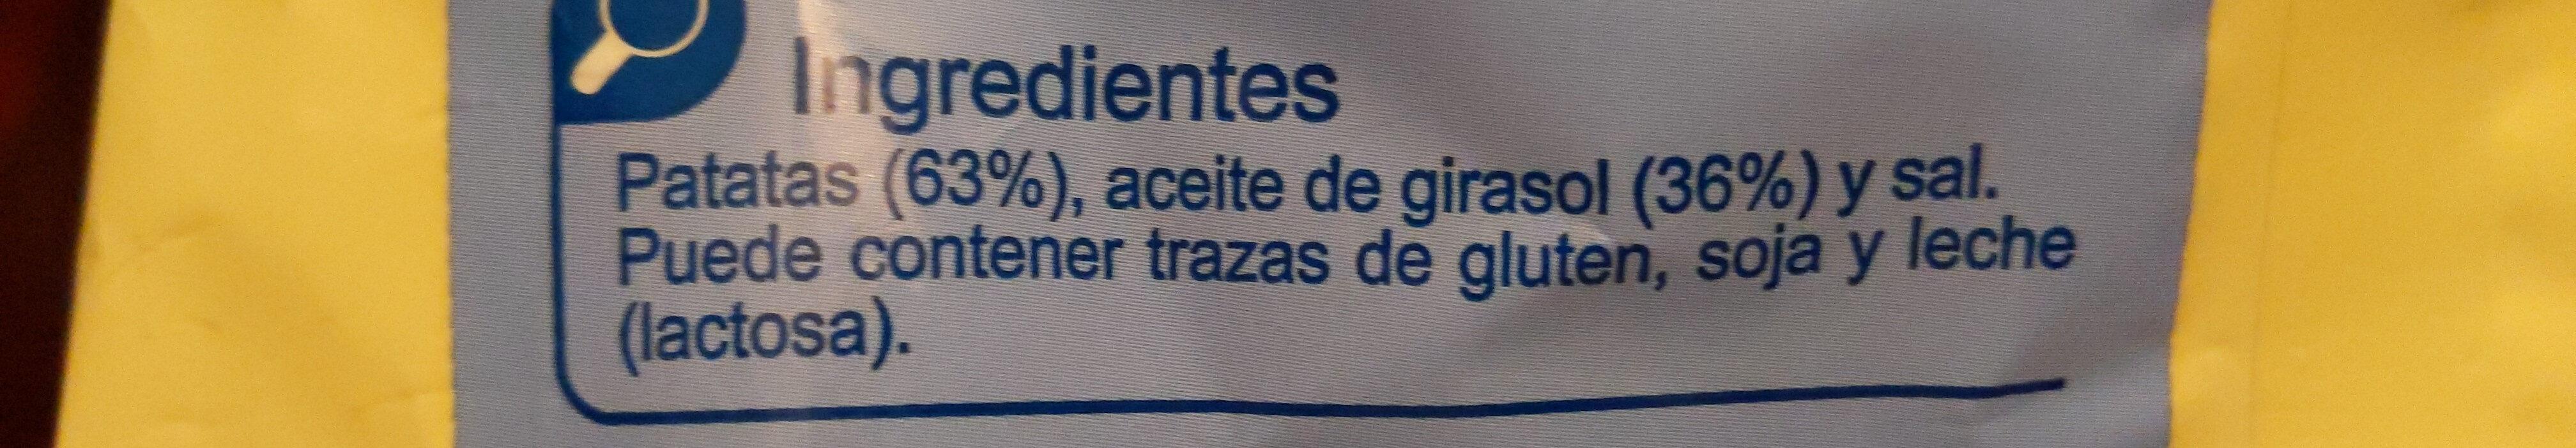 Patatas Fritas Onduladas - Ingrédients - es